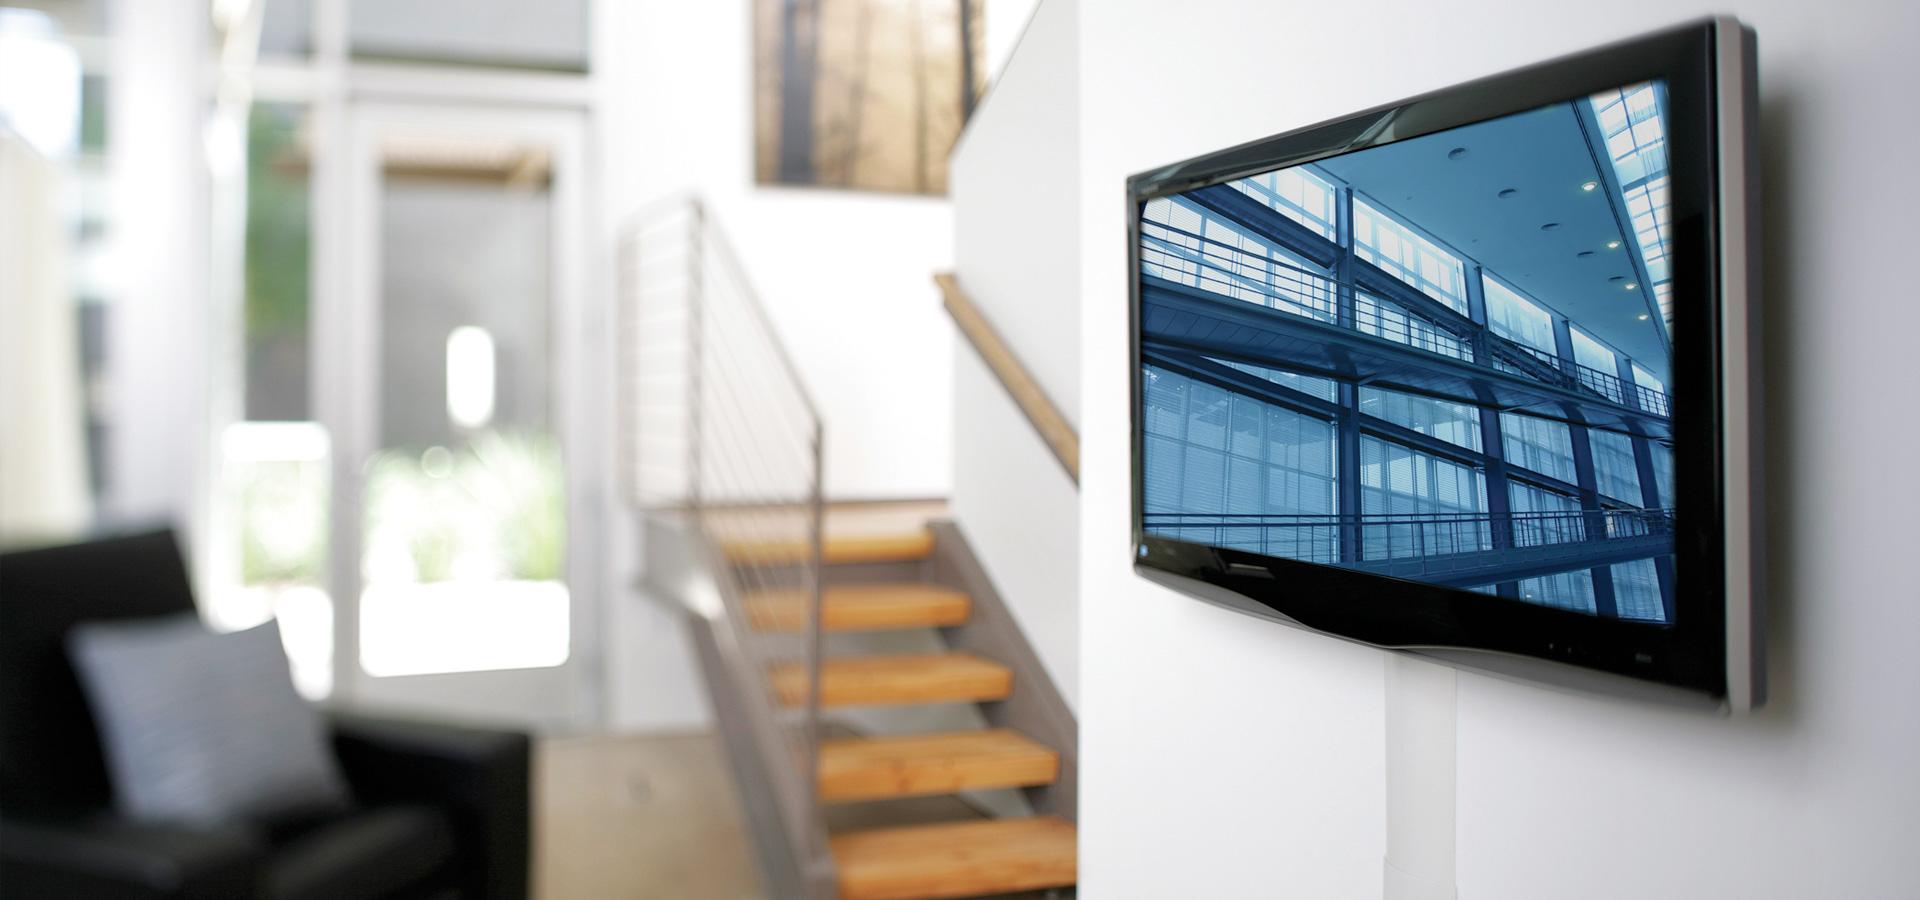 TV REPAIR - TELEVISIONS & VIDEO - Flint Audio & Video